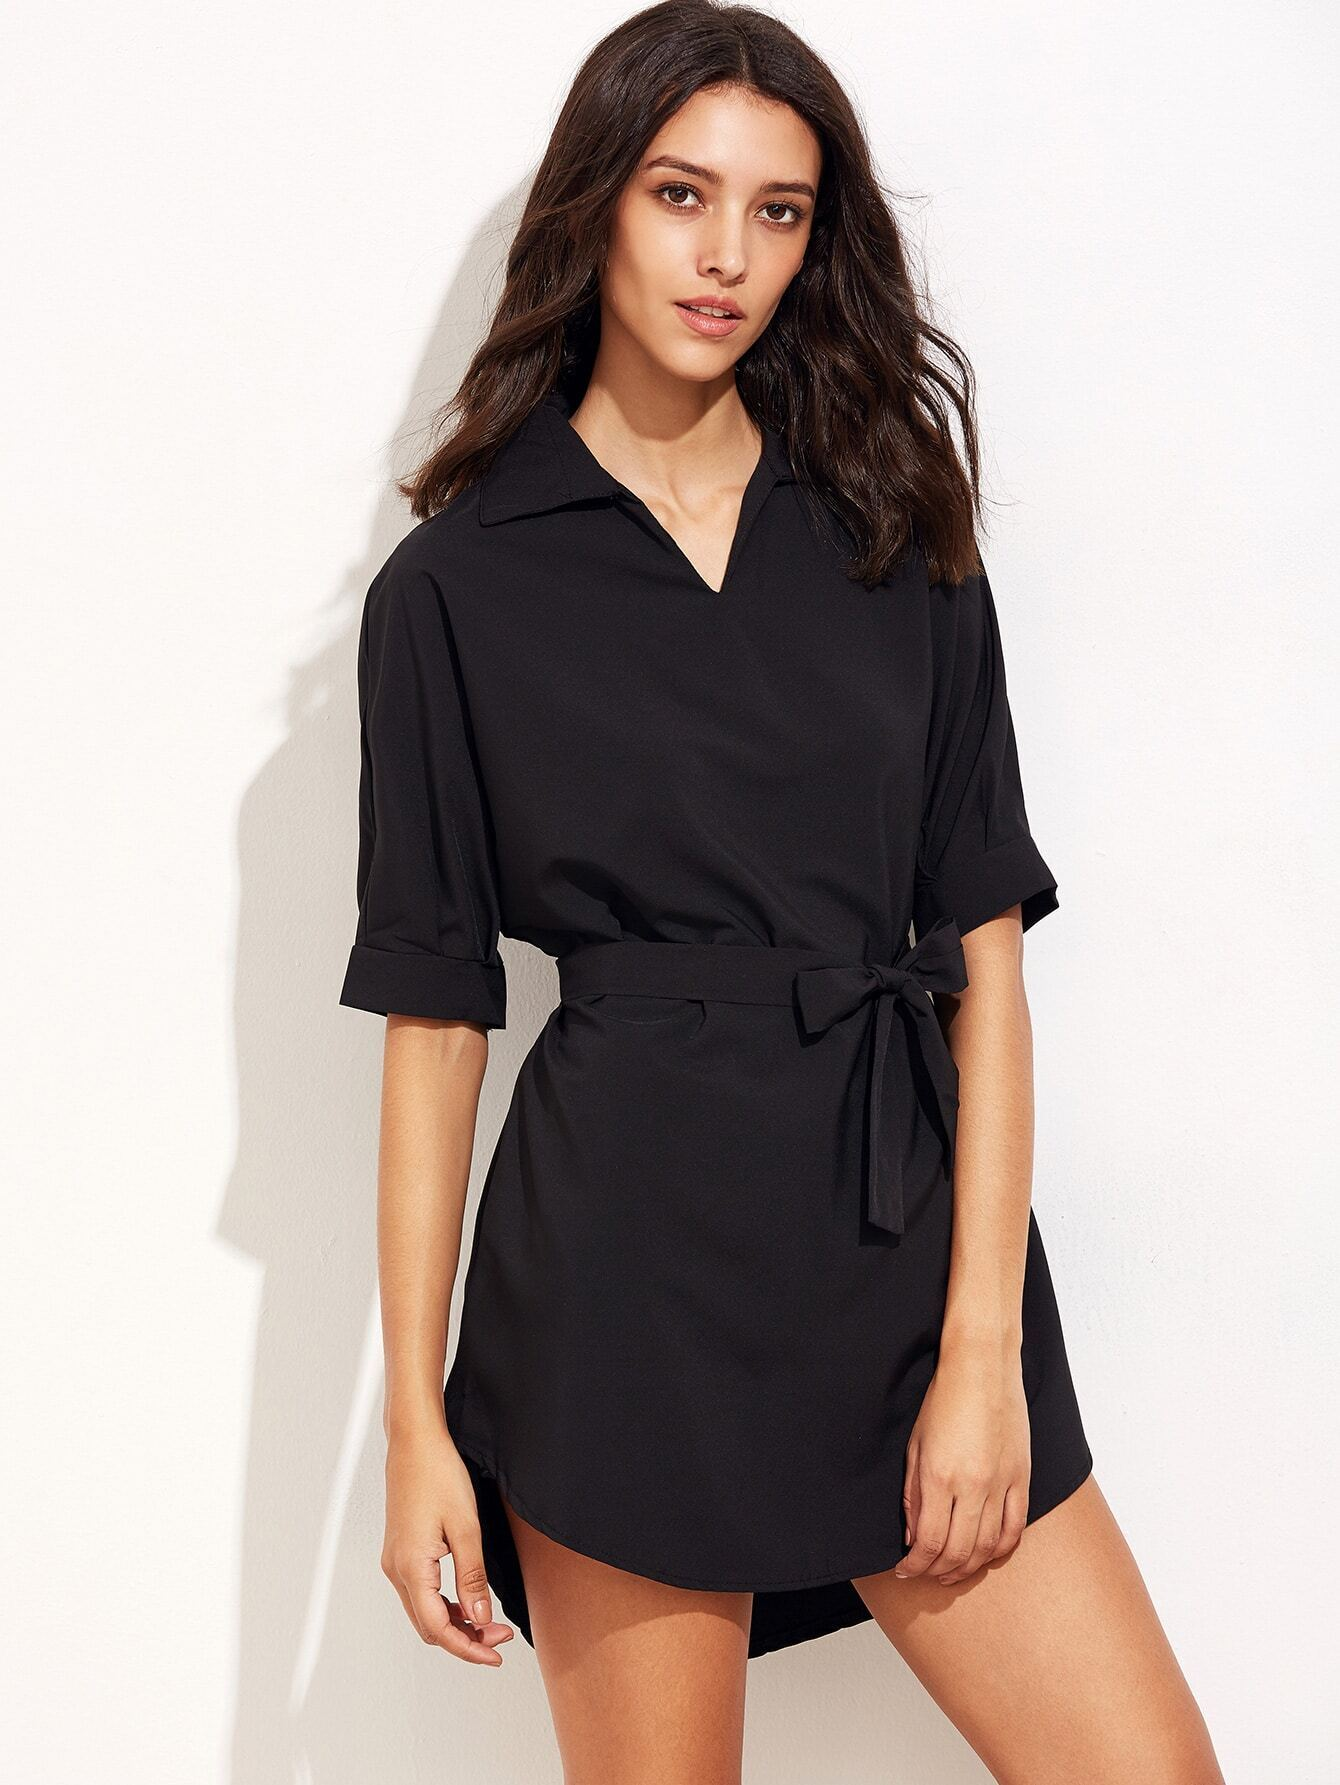 Black Batwing Sleeve Self Tie Shirt DressBlack Batwing Sleeve Self Tie Shirt Dress<br><br>color: Black<br>size: L,M,S